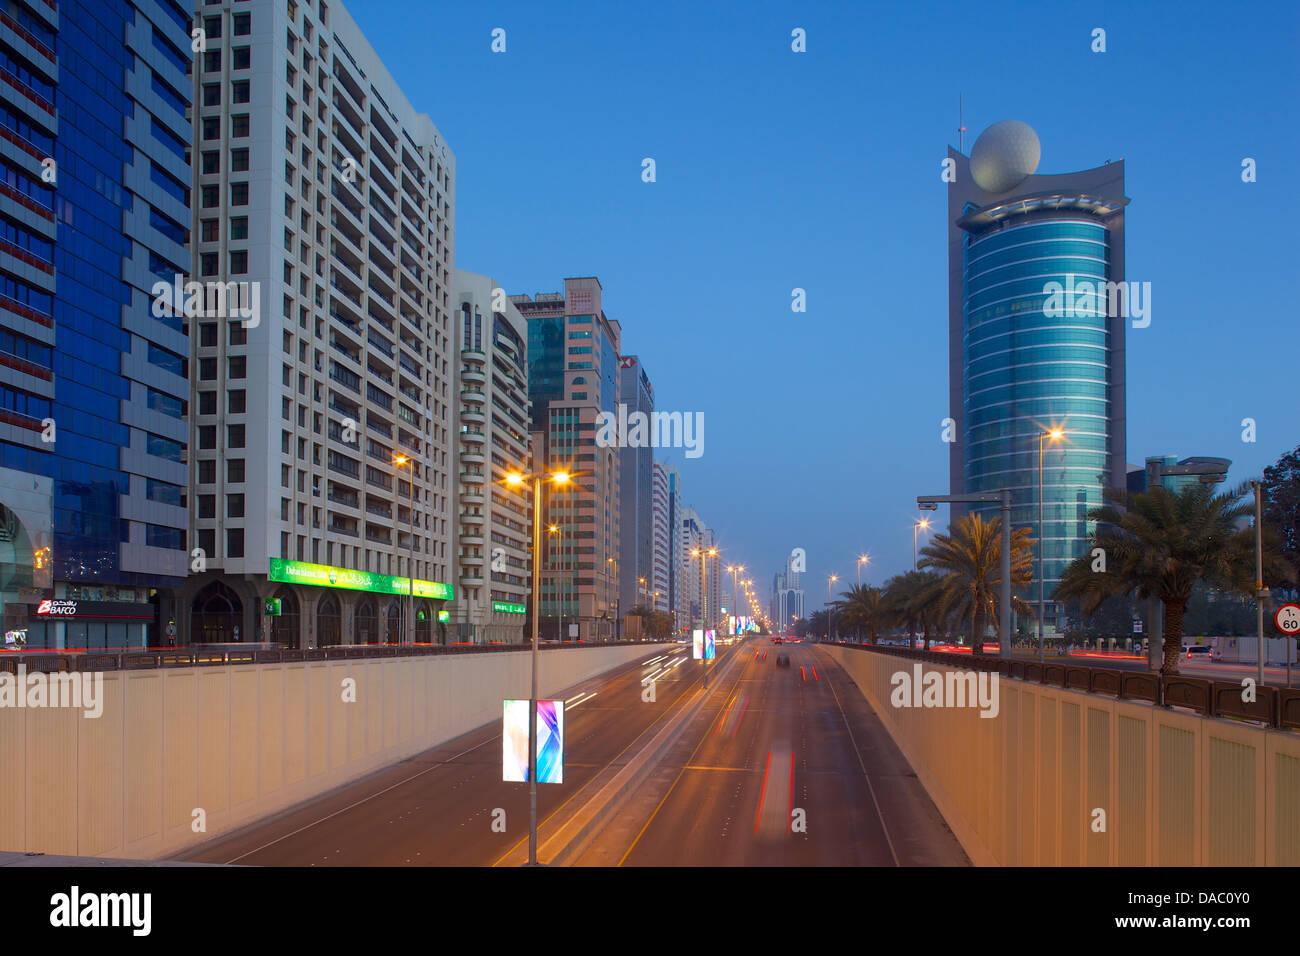 City skyline on Rashid Bin Saeed Al Maktoum Street at dusk, Abu Dhabi, United Arab Emirates, Middle East - Stock Image